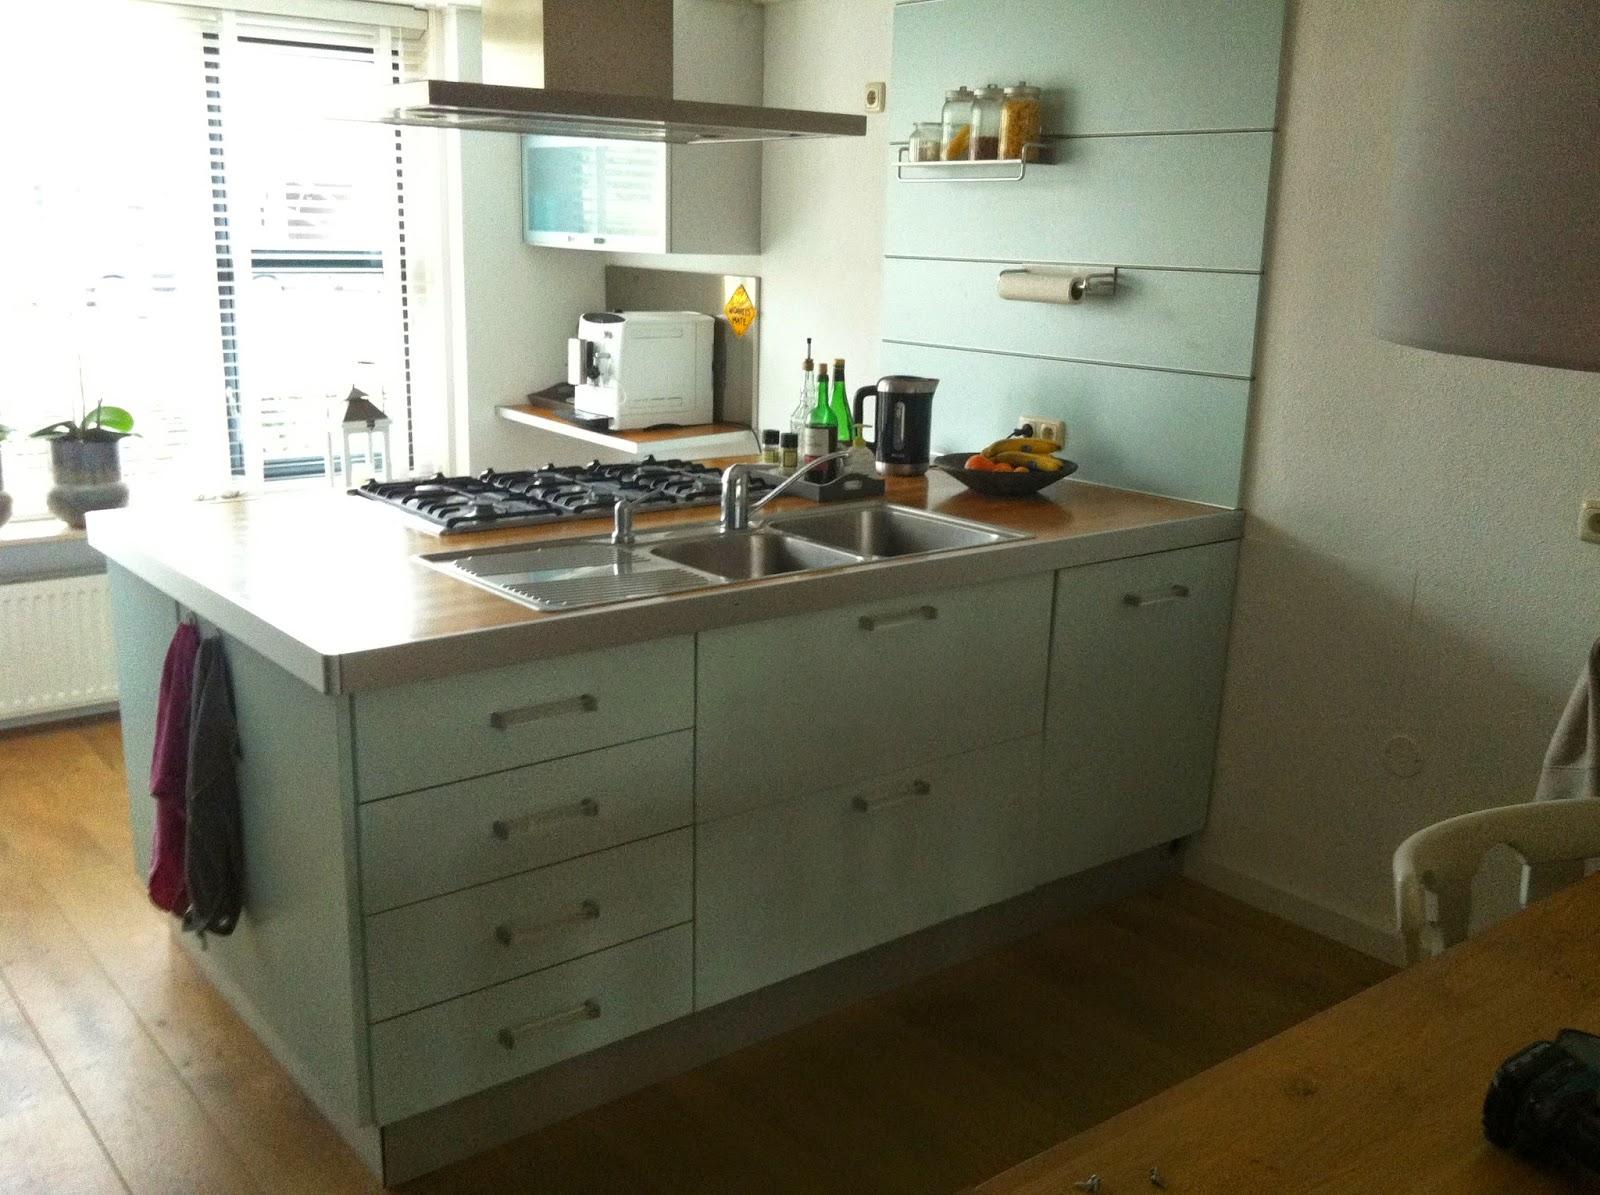 Restylelin diy keuken in de verf - Verf keuken lichtgrijs ...